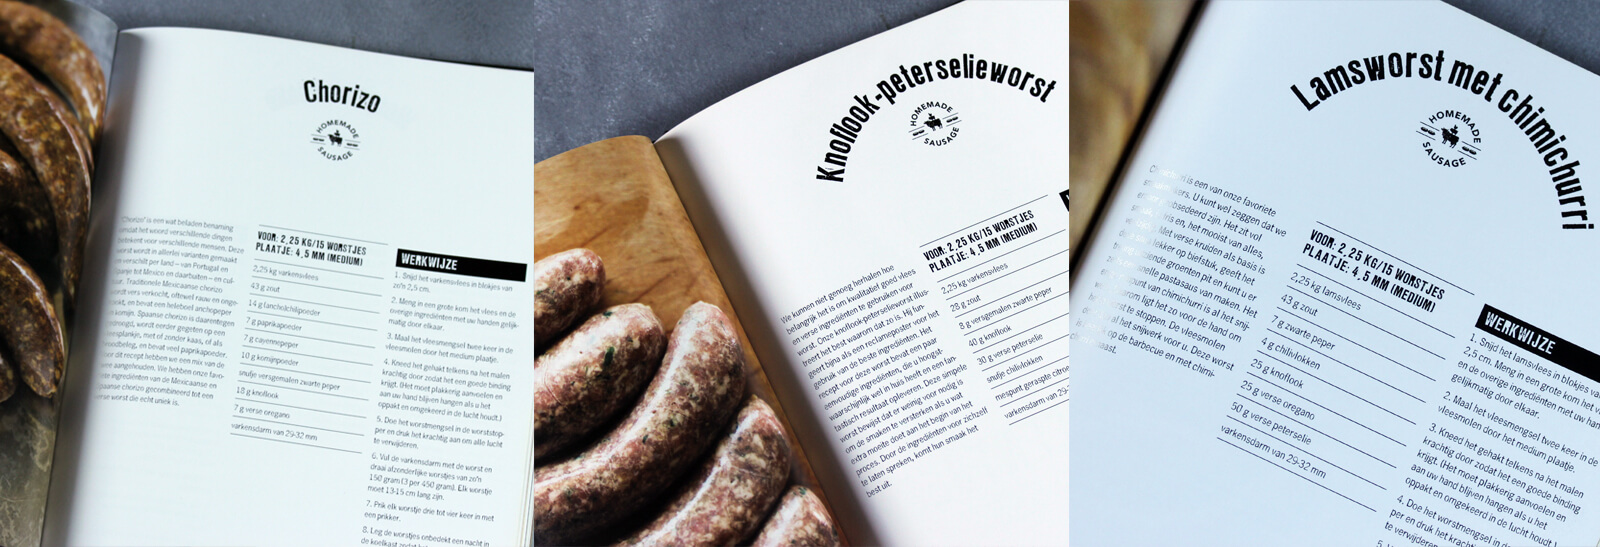 Homemade Sausage - recepten